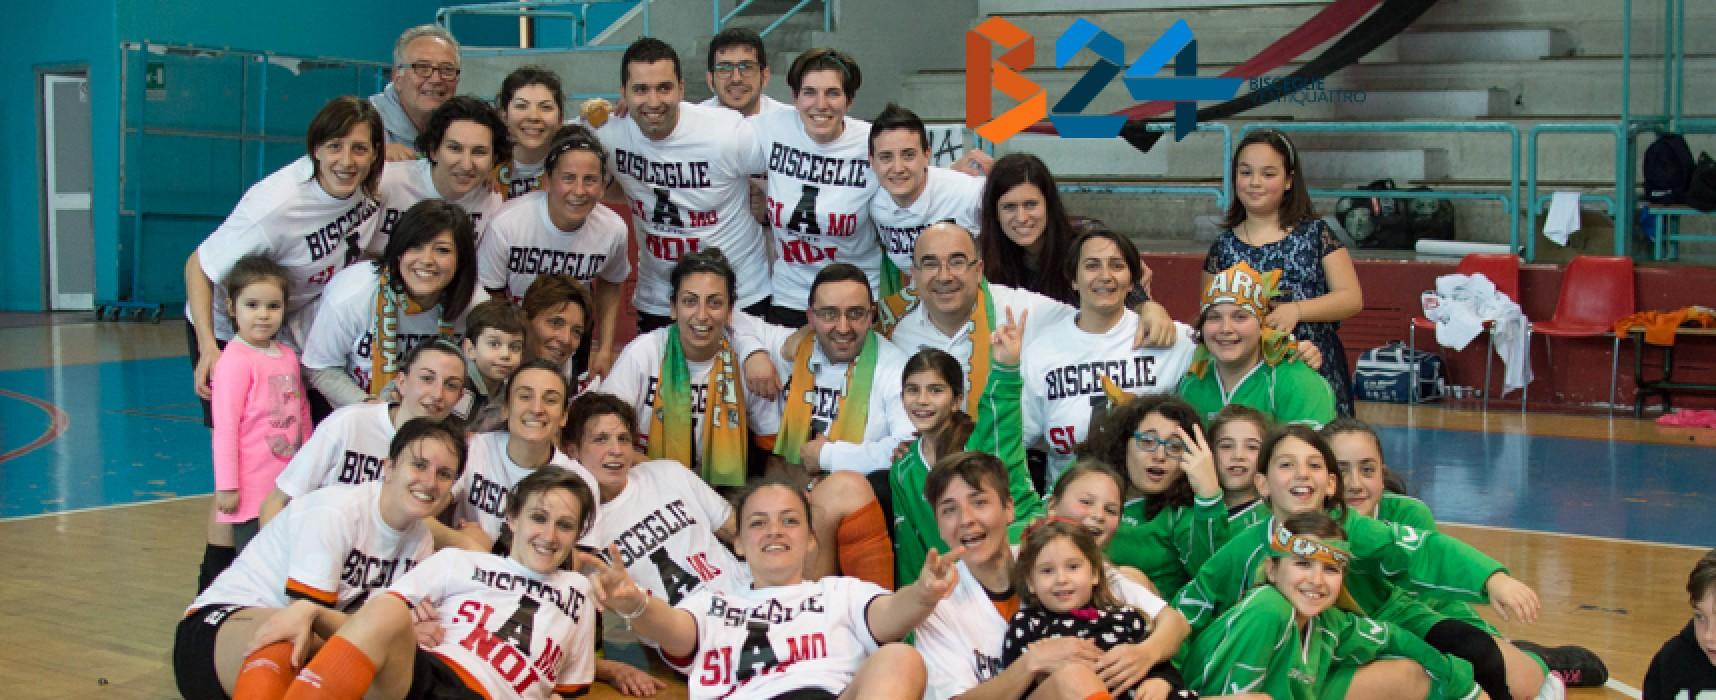 Calendario Serie A Elite: esordio a Napoli per l'Arcadia Verysimple Bisceglie